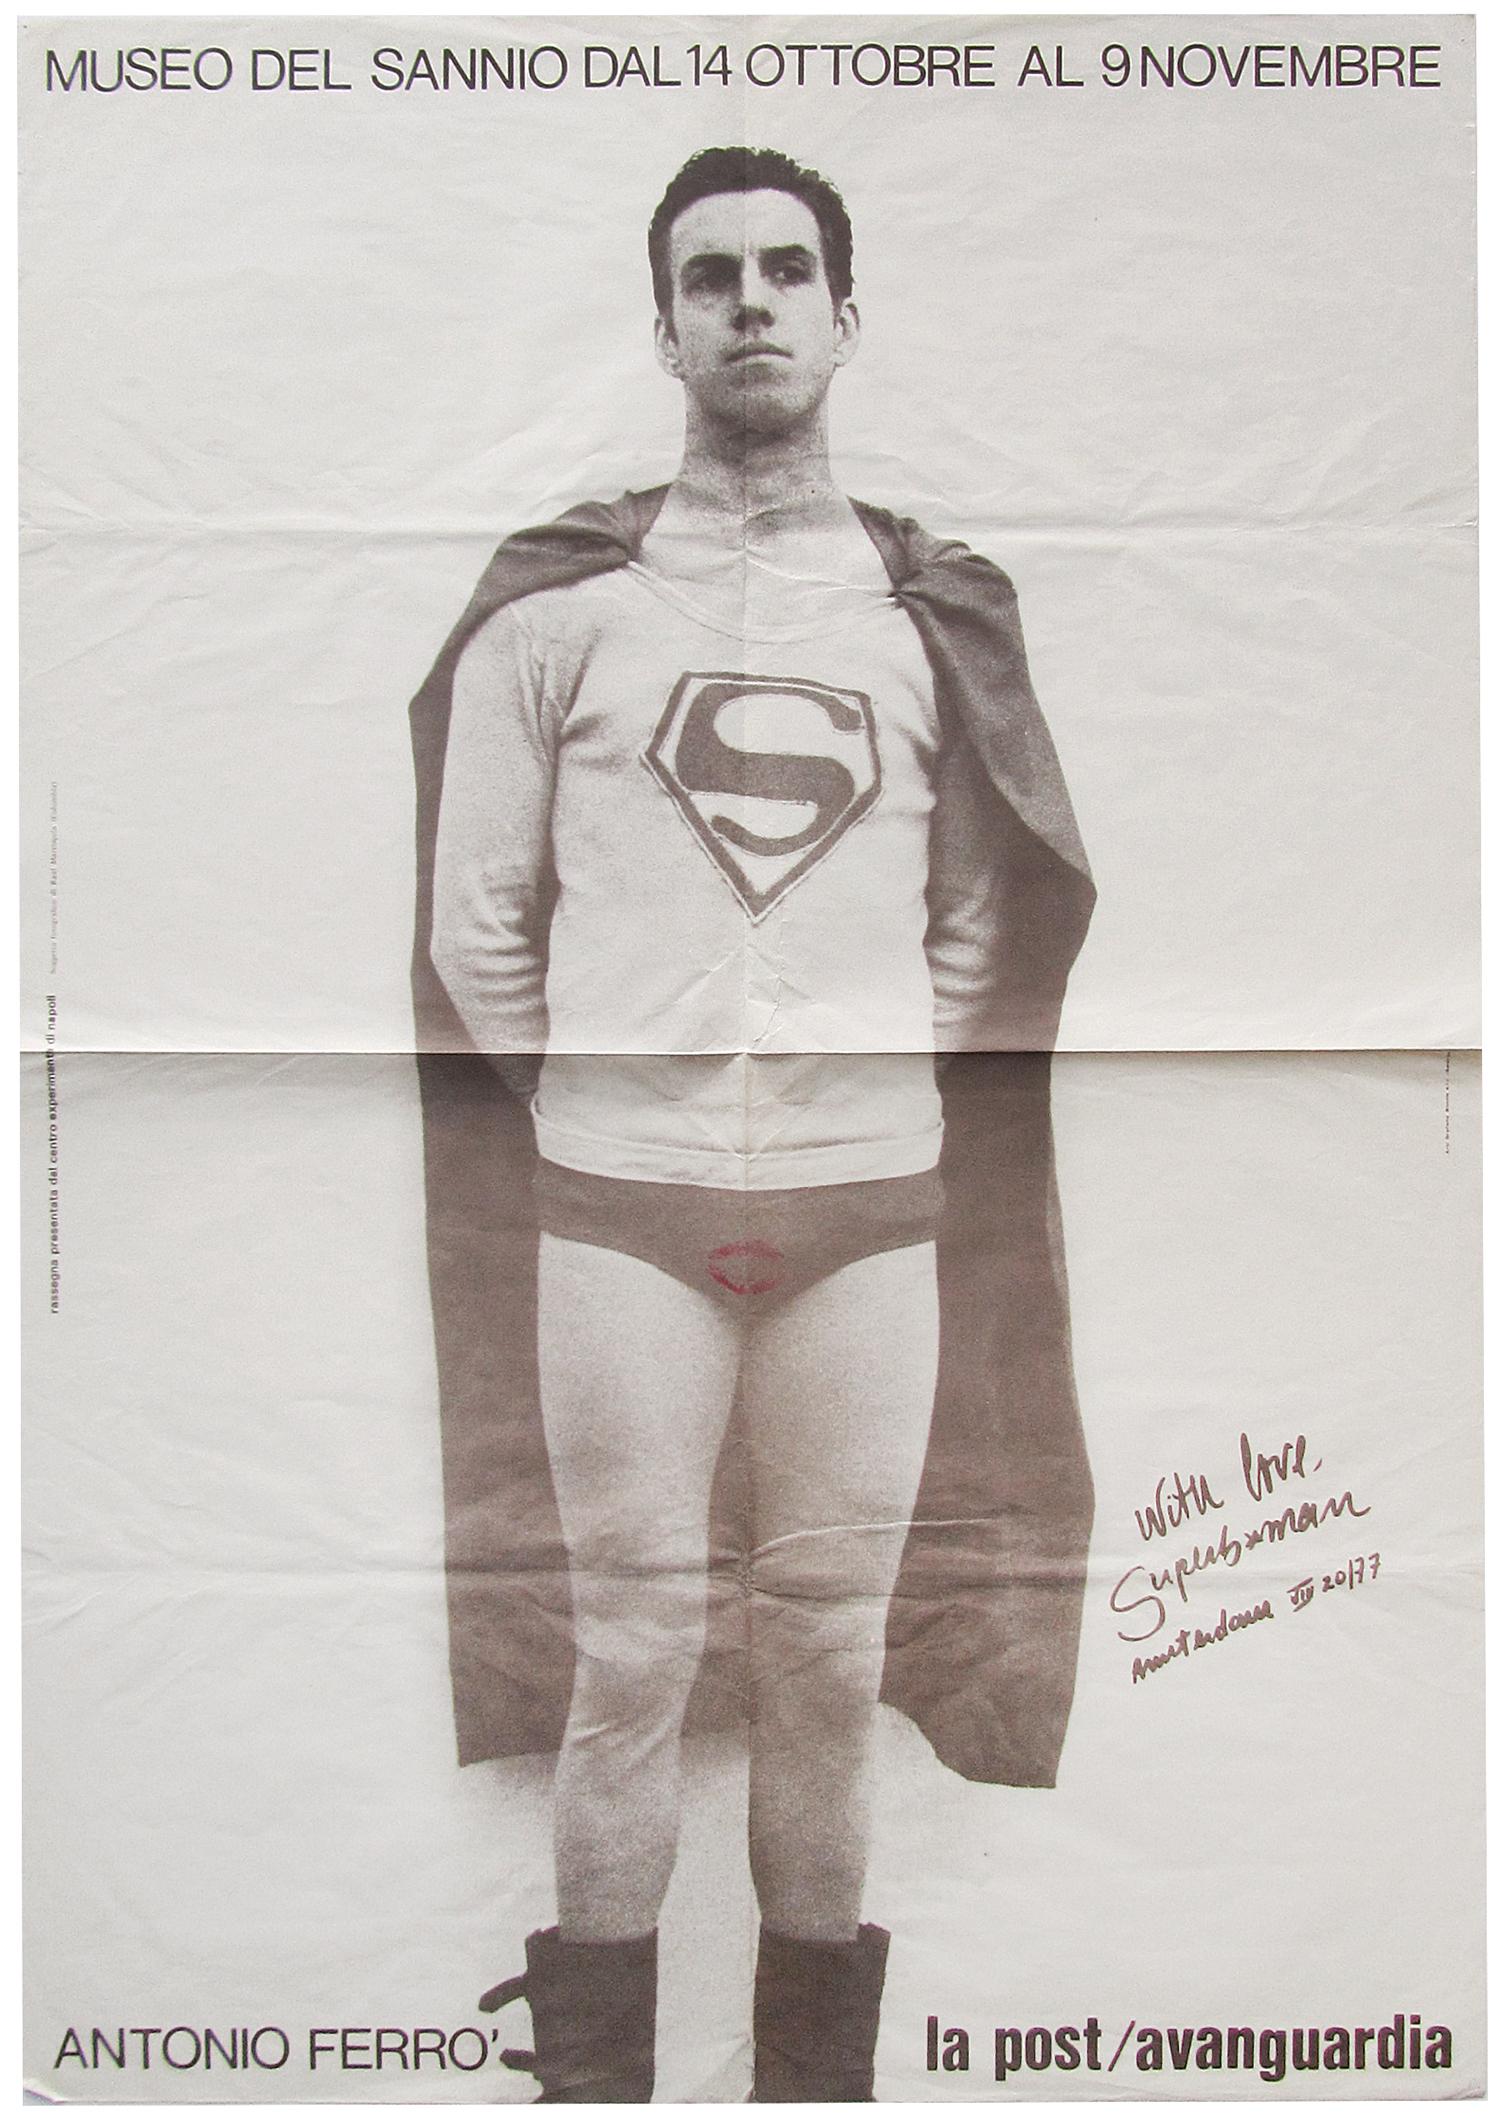 Marroquin_superbman_antonioferro-web.jpg